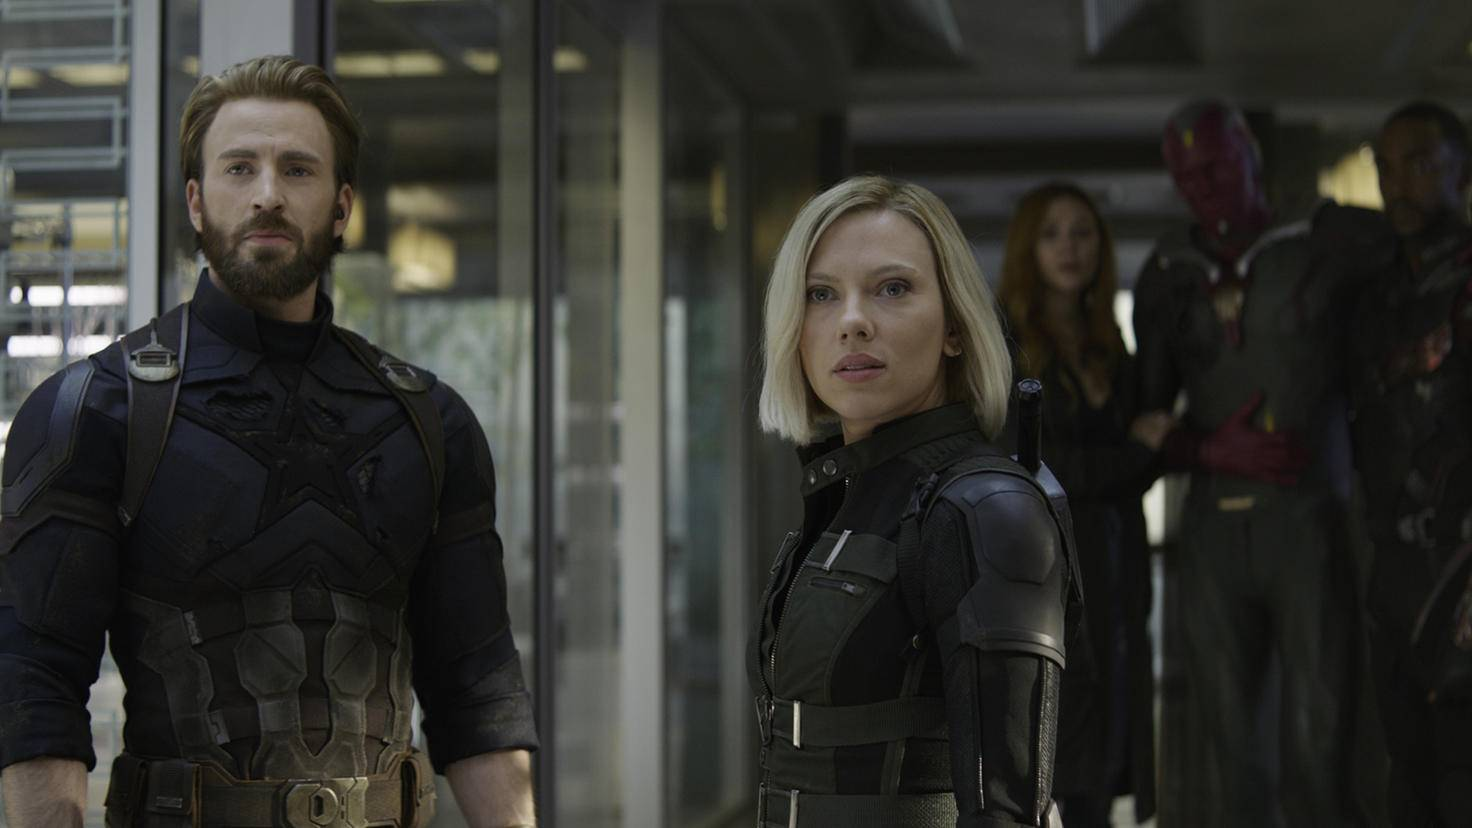 Cap und Black Widow in Avengers Infinity War